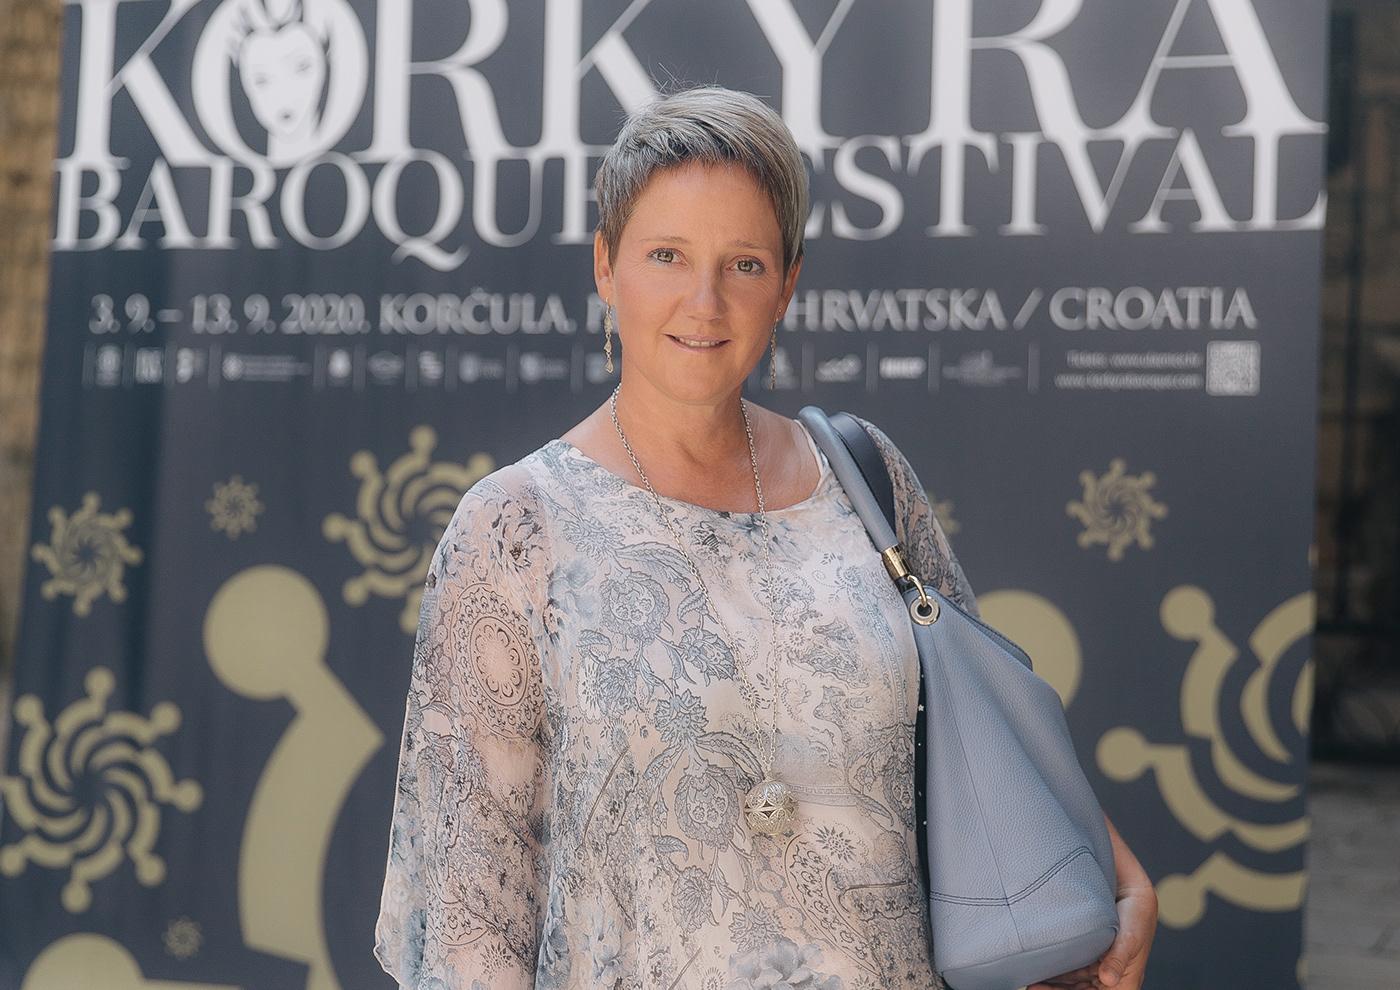 Boris Berc branding  classical music Croatian Baroque Ensemble festival Korcula  Korkyra Baroque Festival Laura Vadjon visual zvonimir ferina